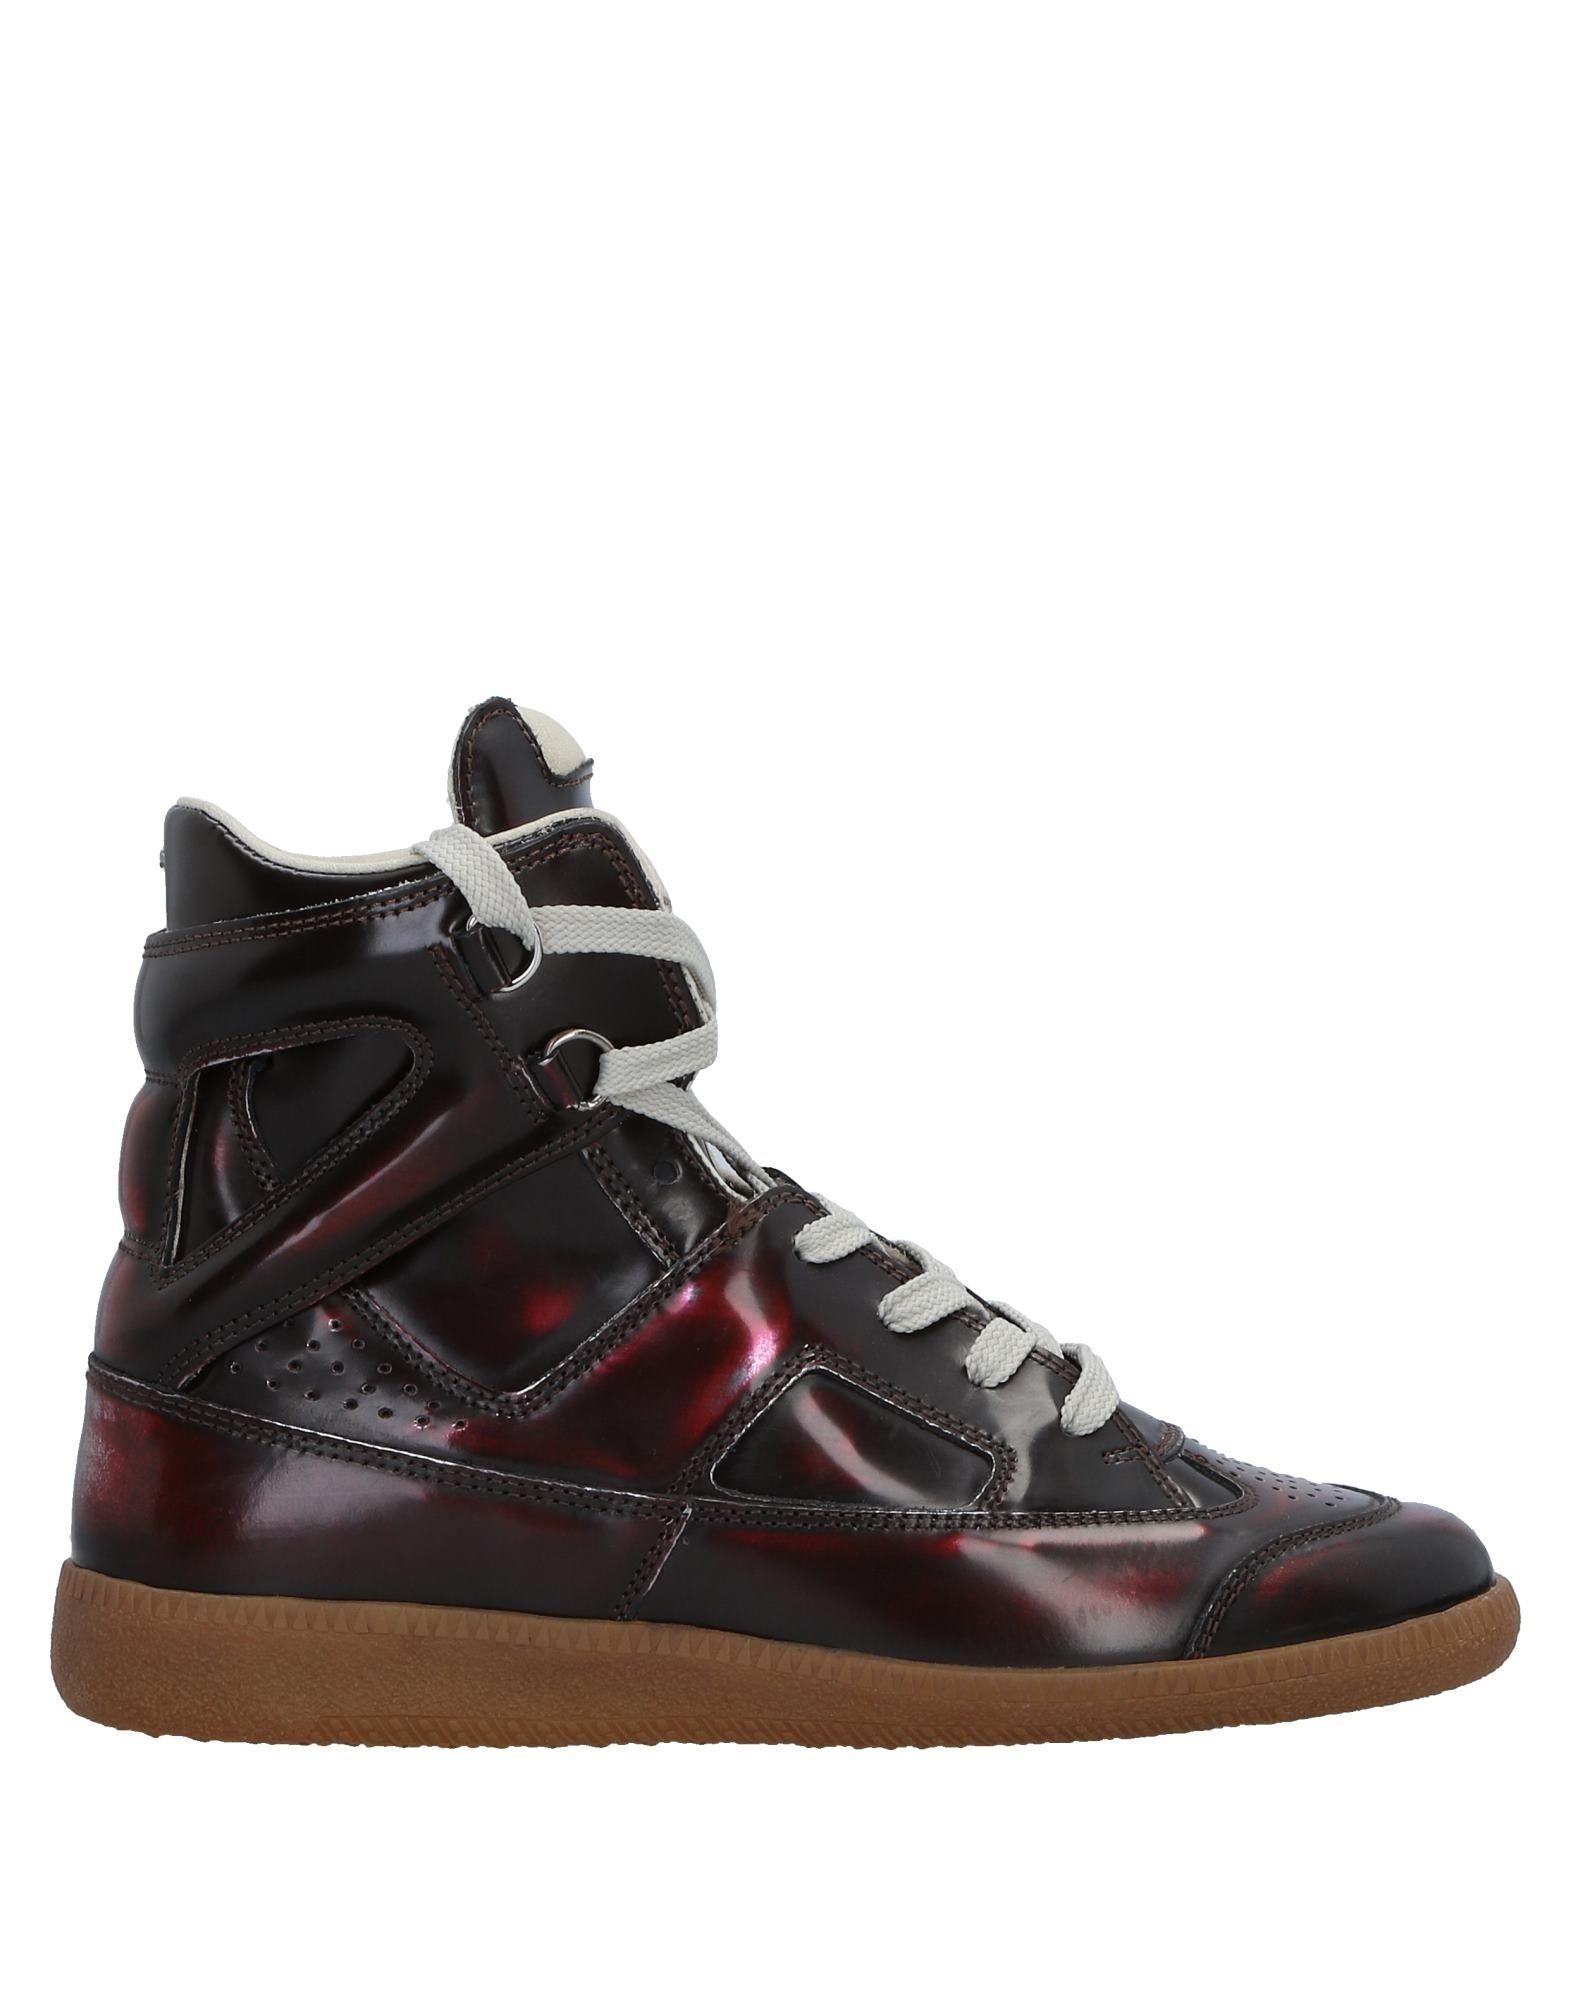 Maison Margiela Sneakers Damen  11498360JXGünstige gut aussehende Schuhe